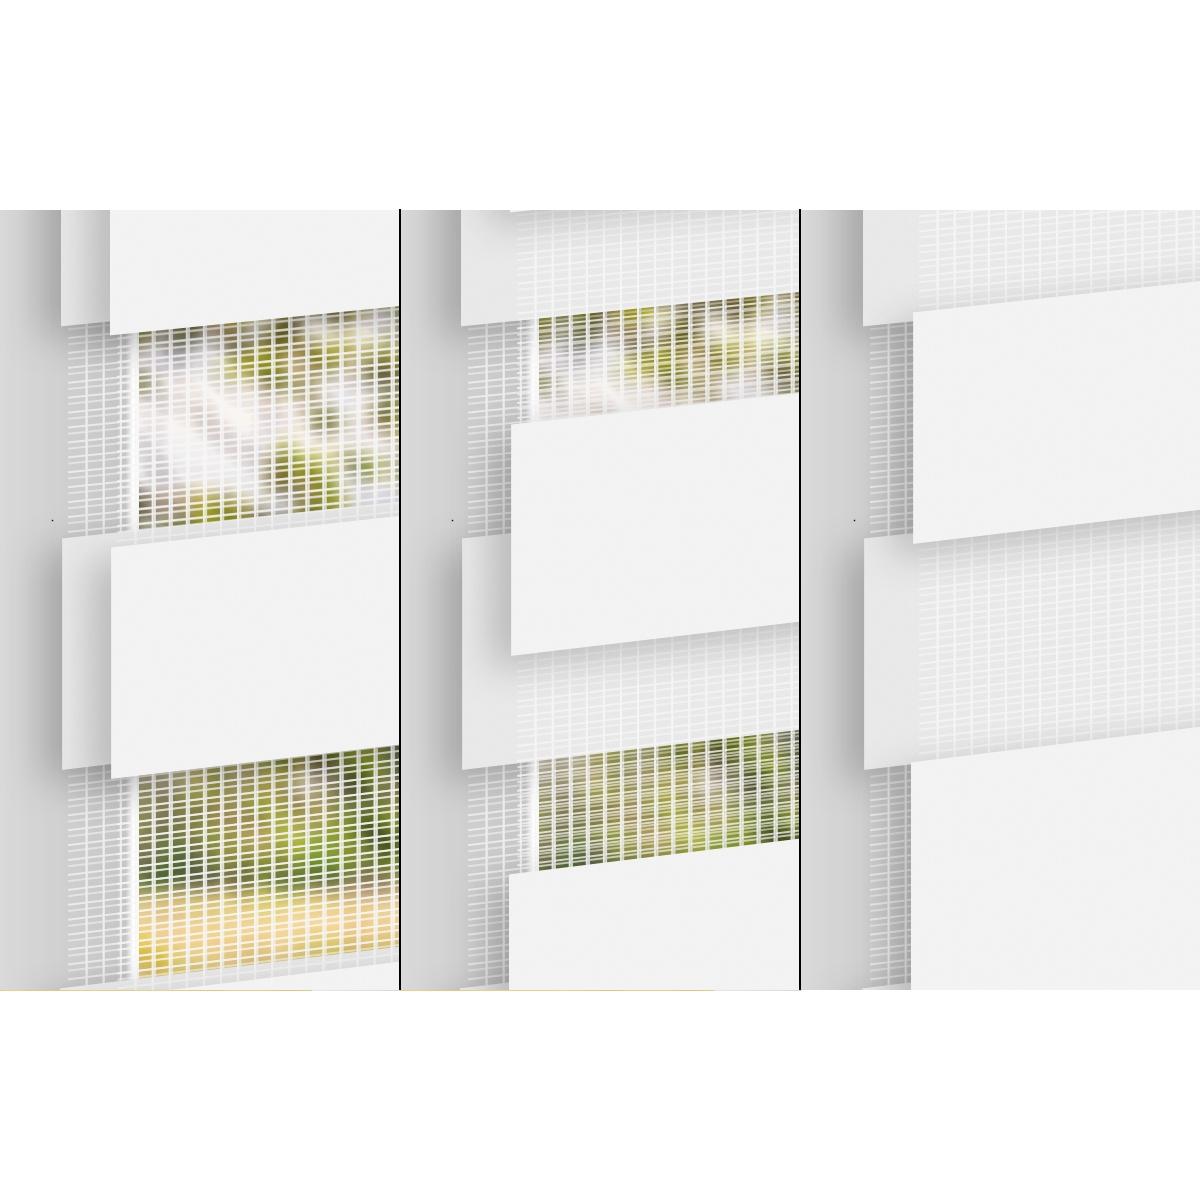 ecd germany verdunkelungsrollo seitenzugrollo doppelrollo plissee klemmfix ebay. Black Bedroom Furniture Sets. Home Design Ideas